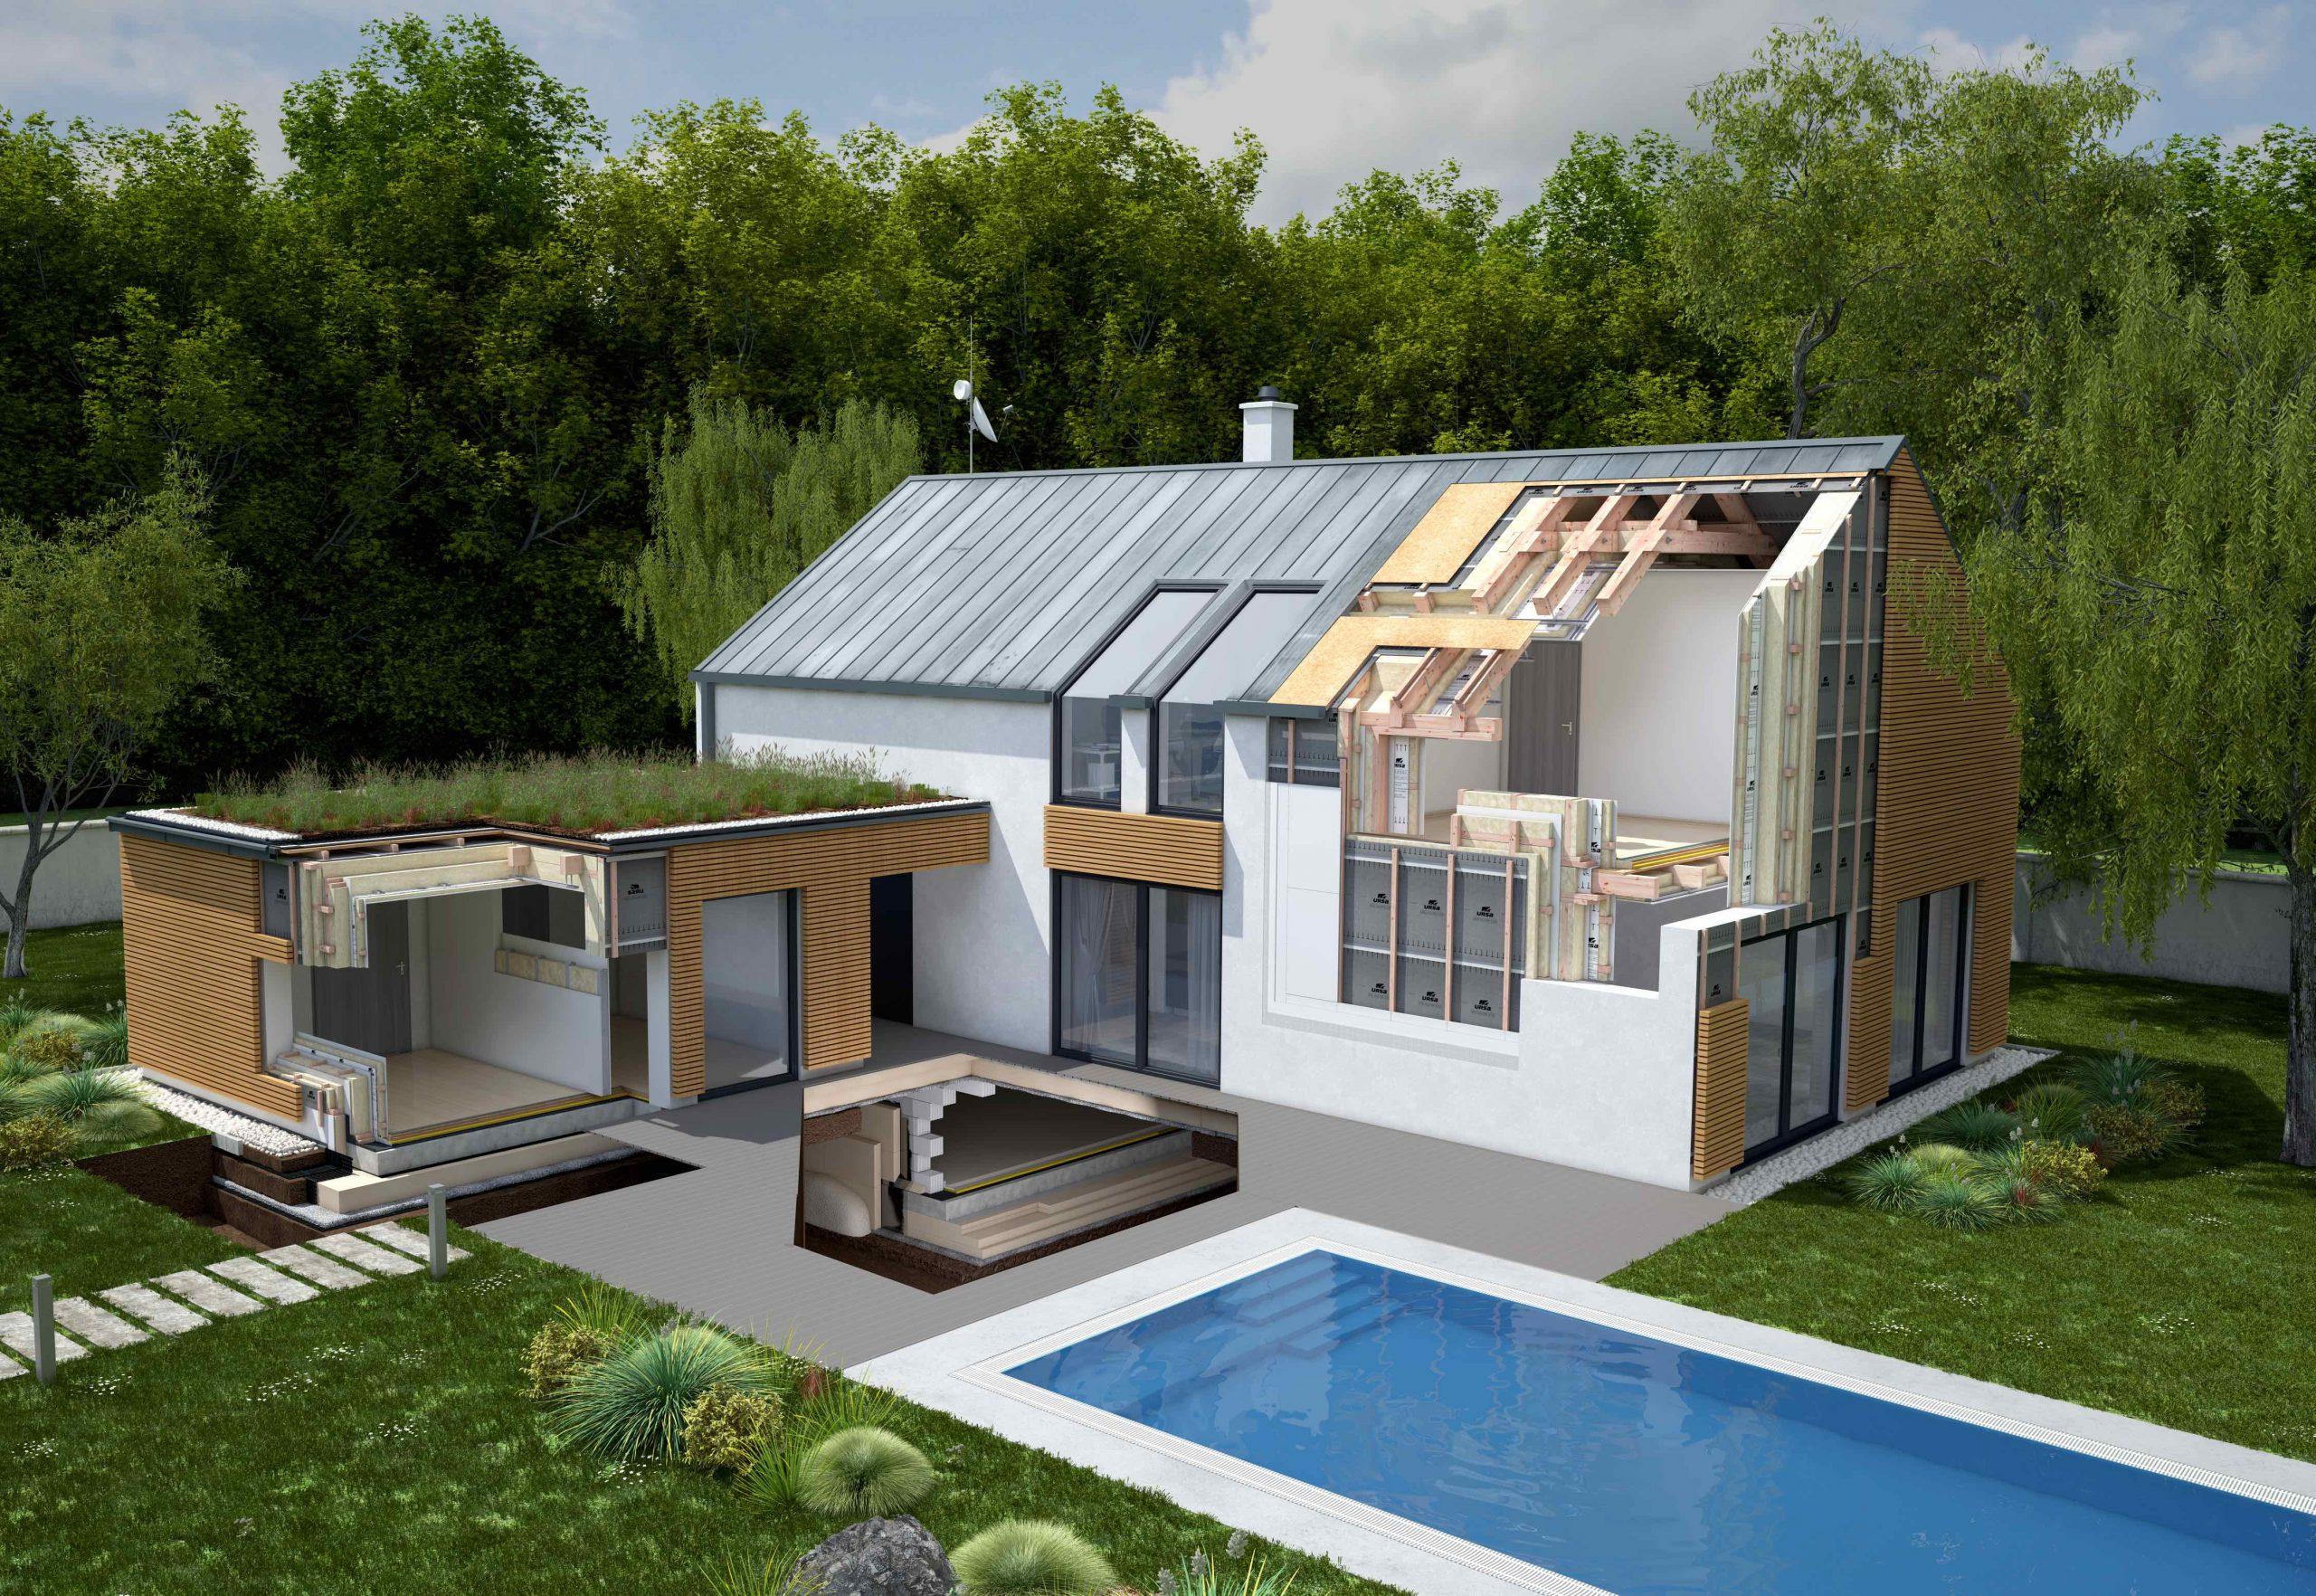 Rodinný dom s grafickou ukážkou zatepľovacieo systému